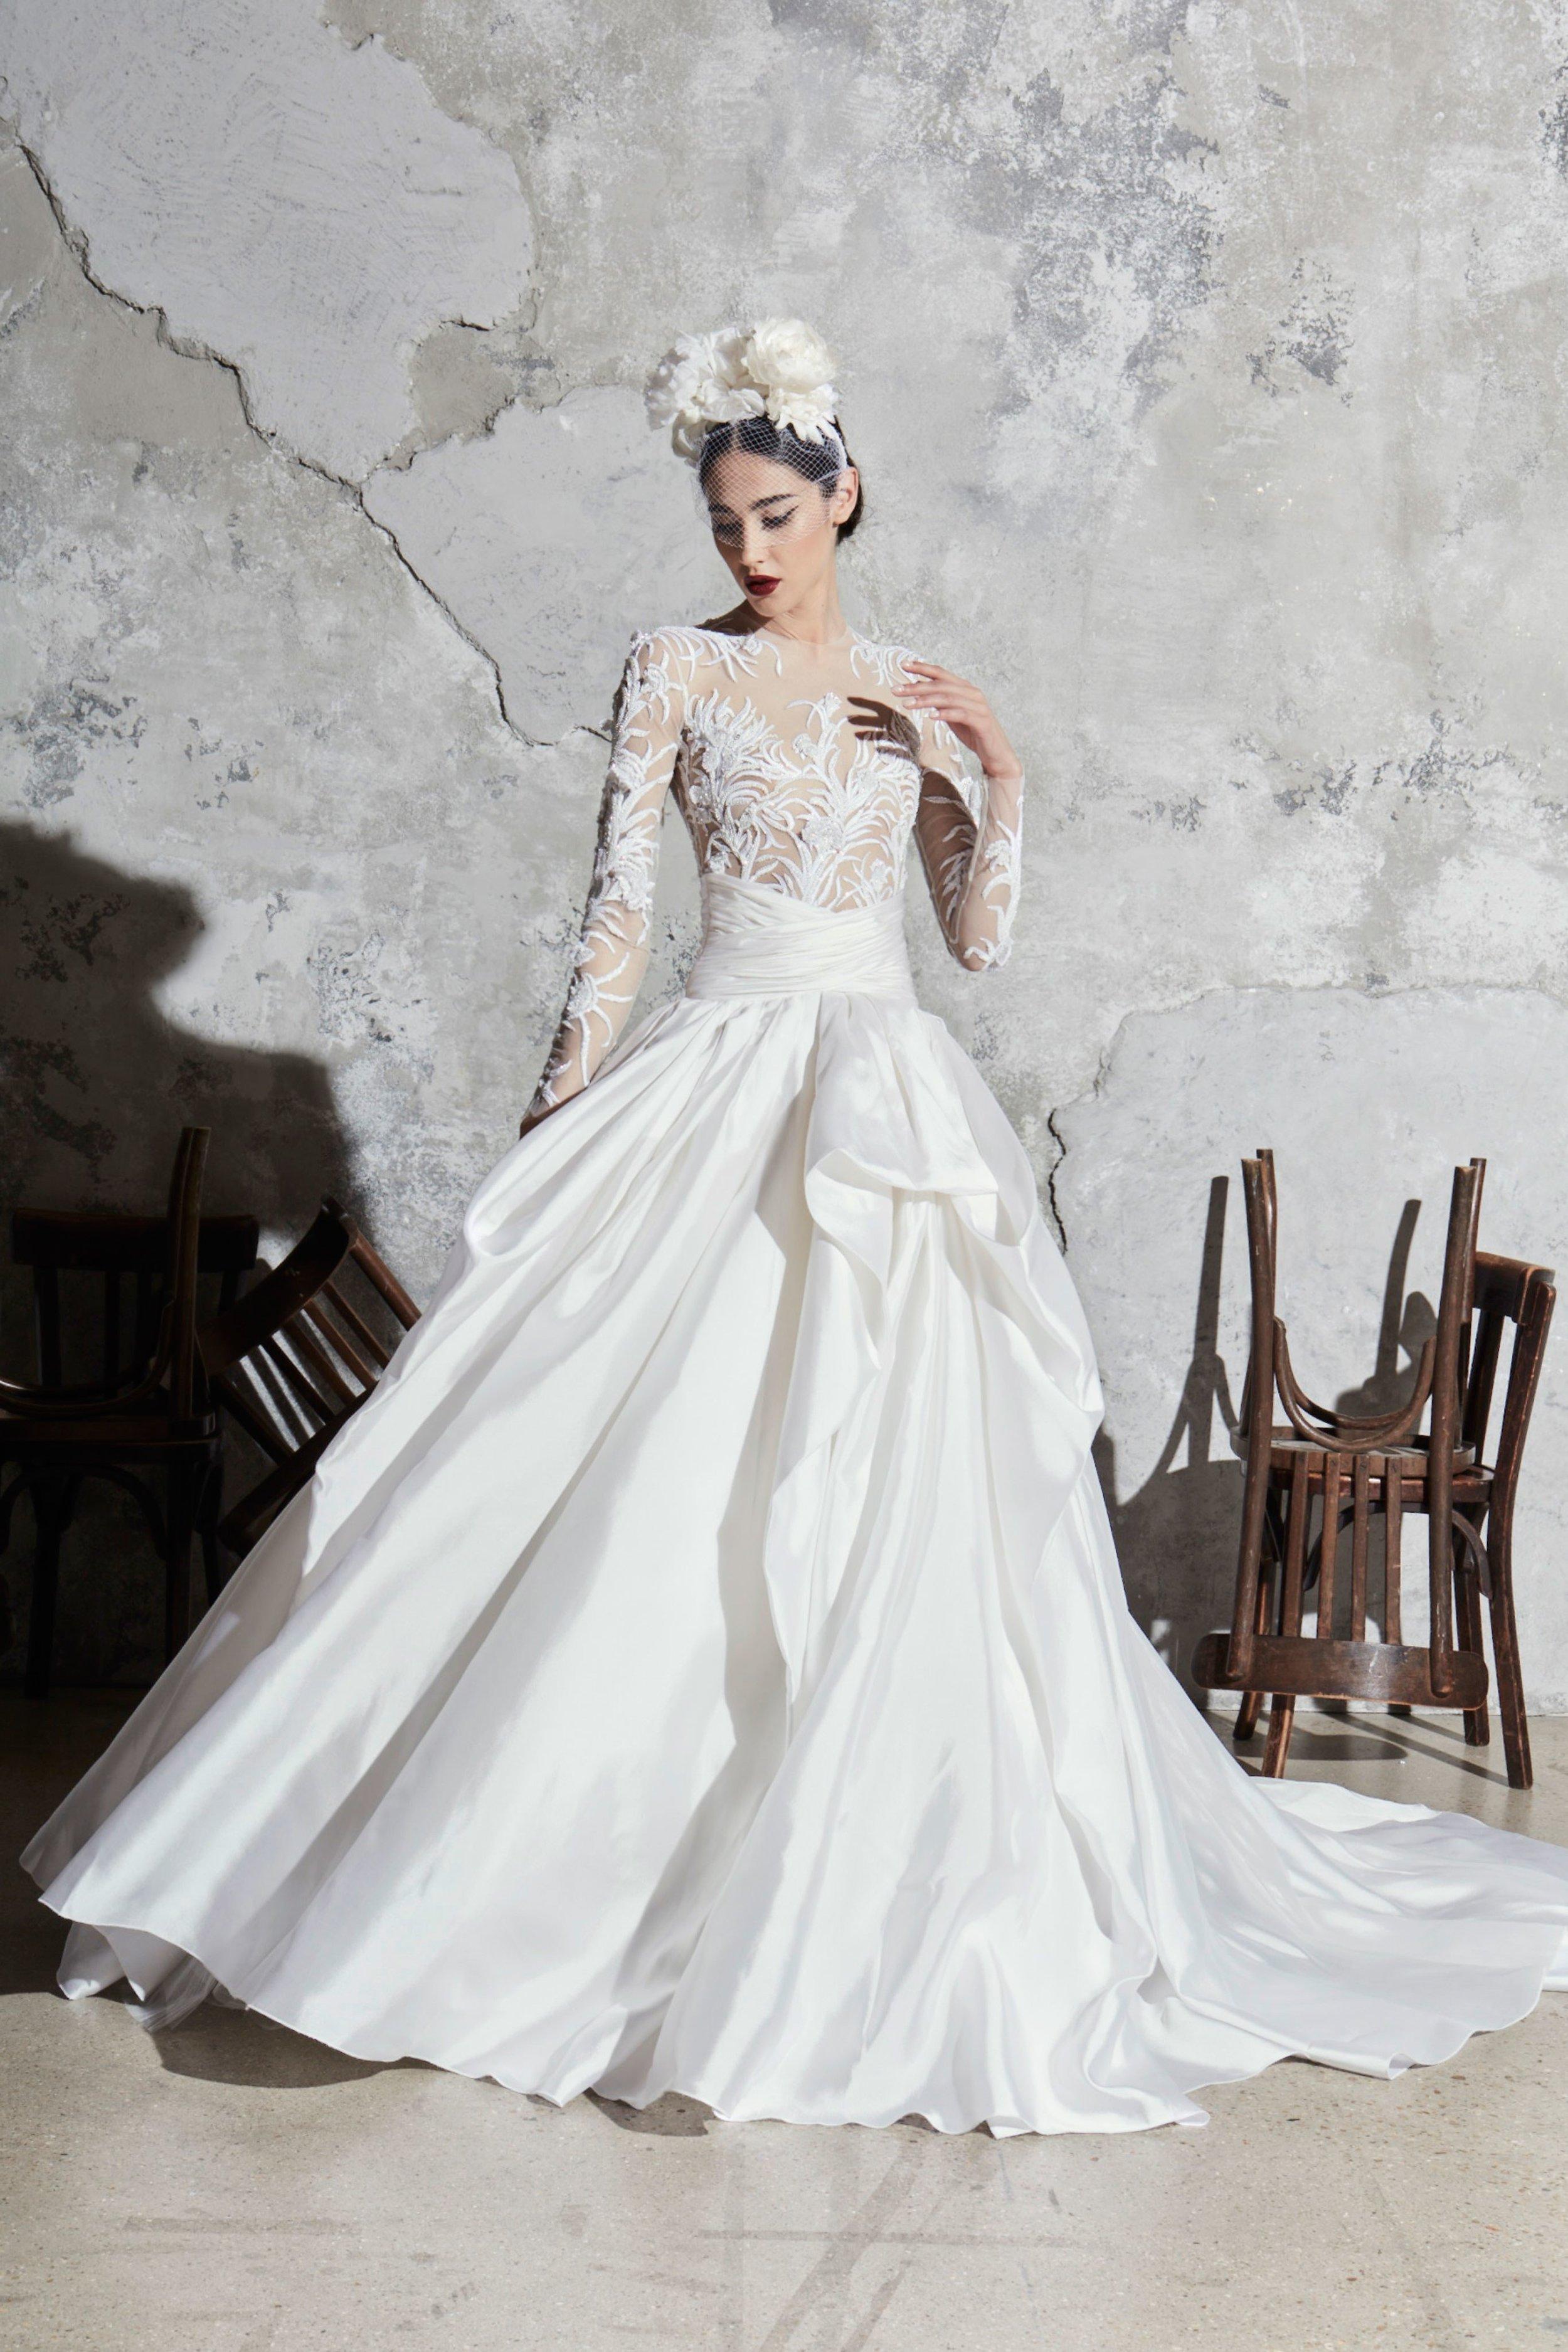 00010-zuhair-murad-new-york-bridal-Spring-2020-CREDIT-Thomas-Nutzl.jpg